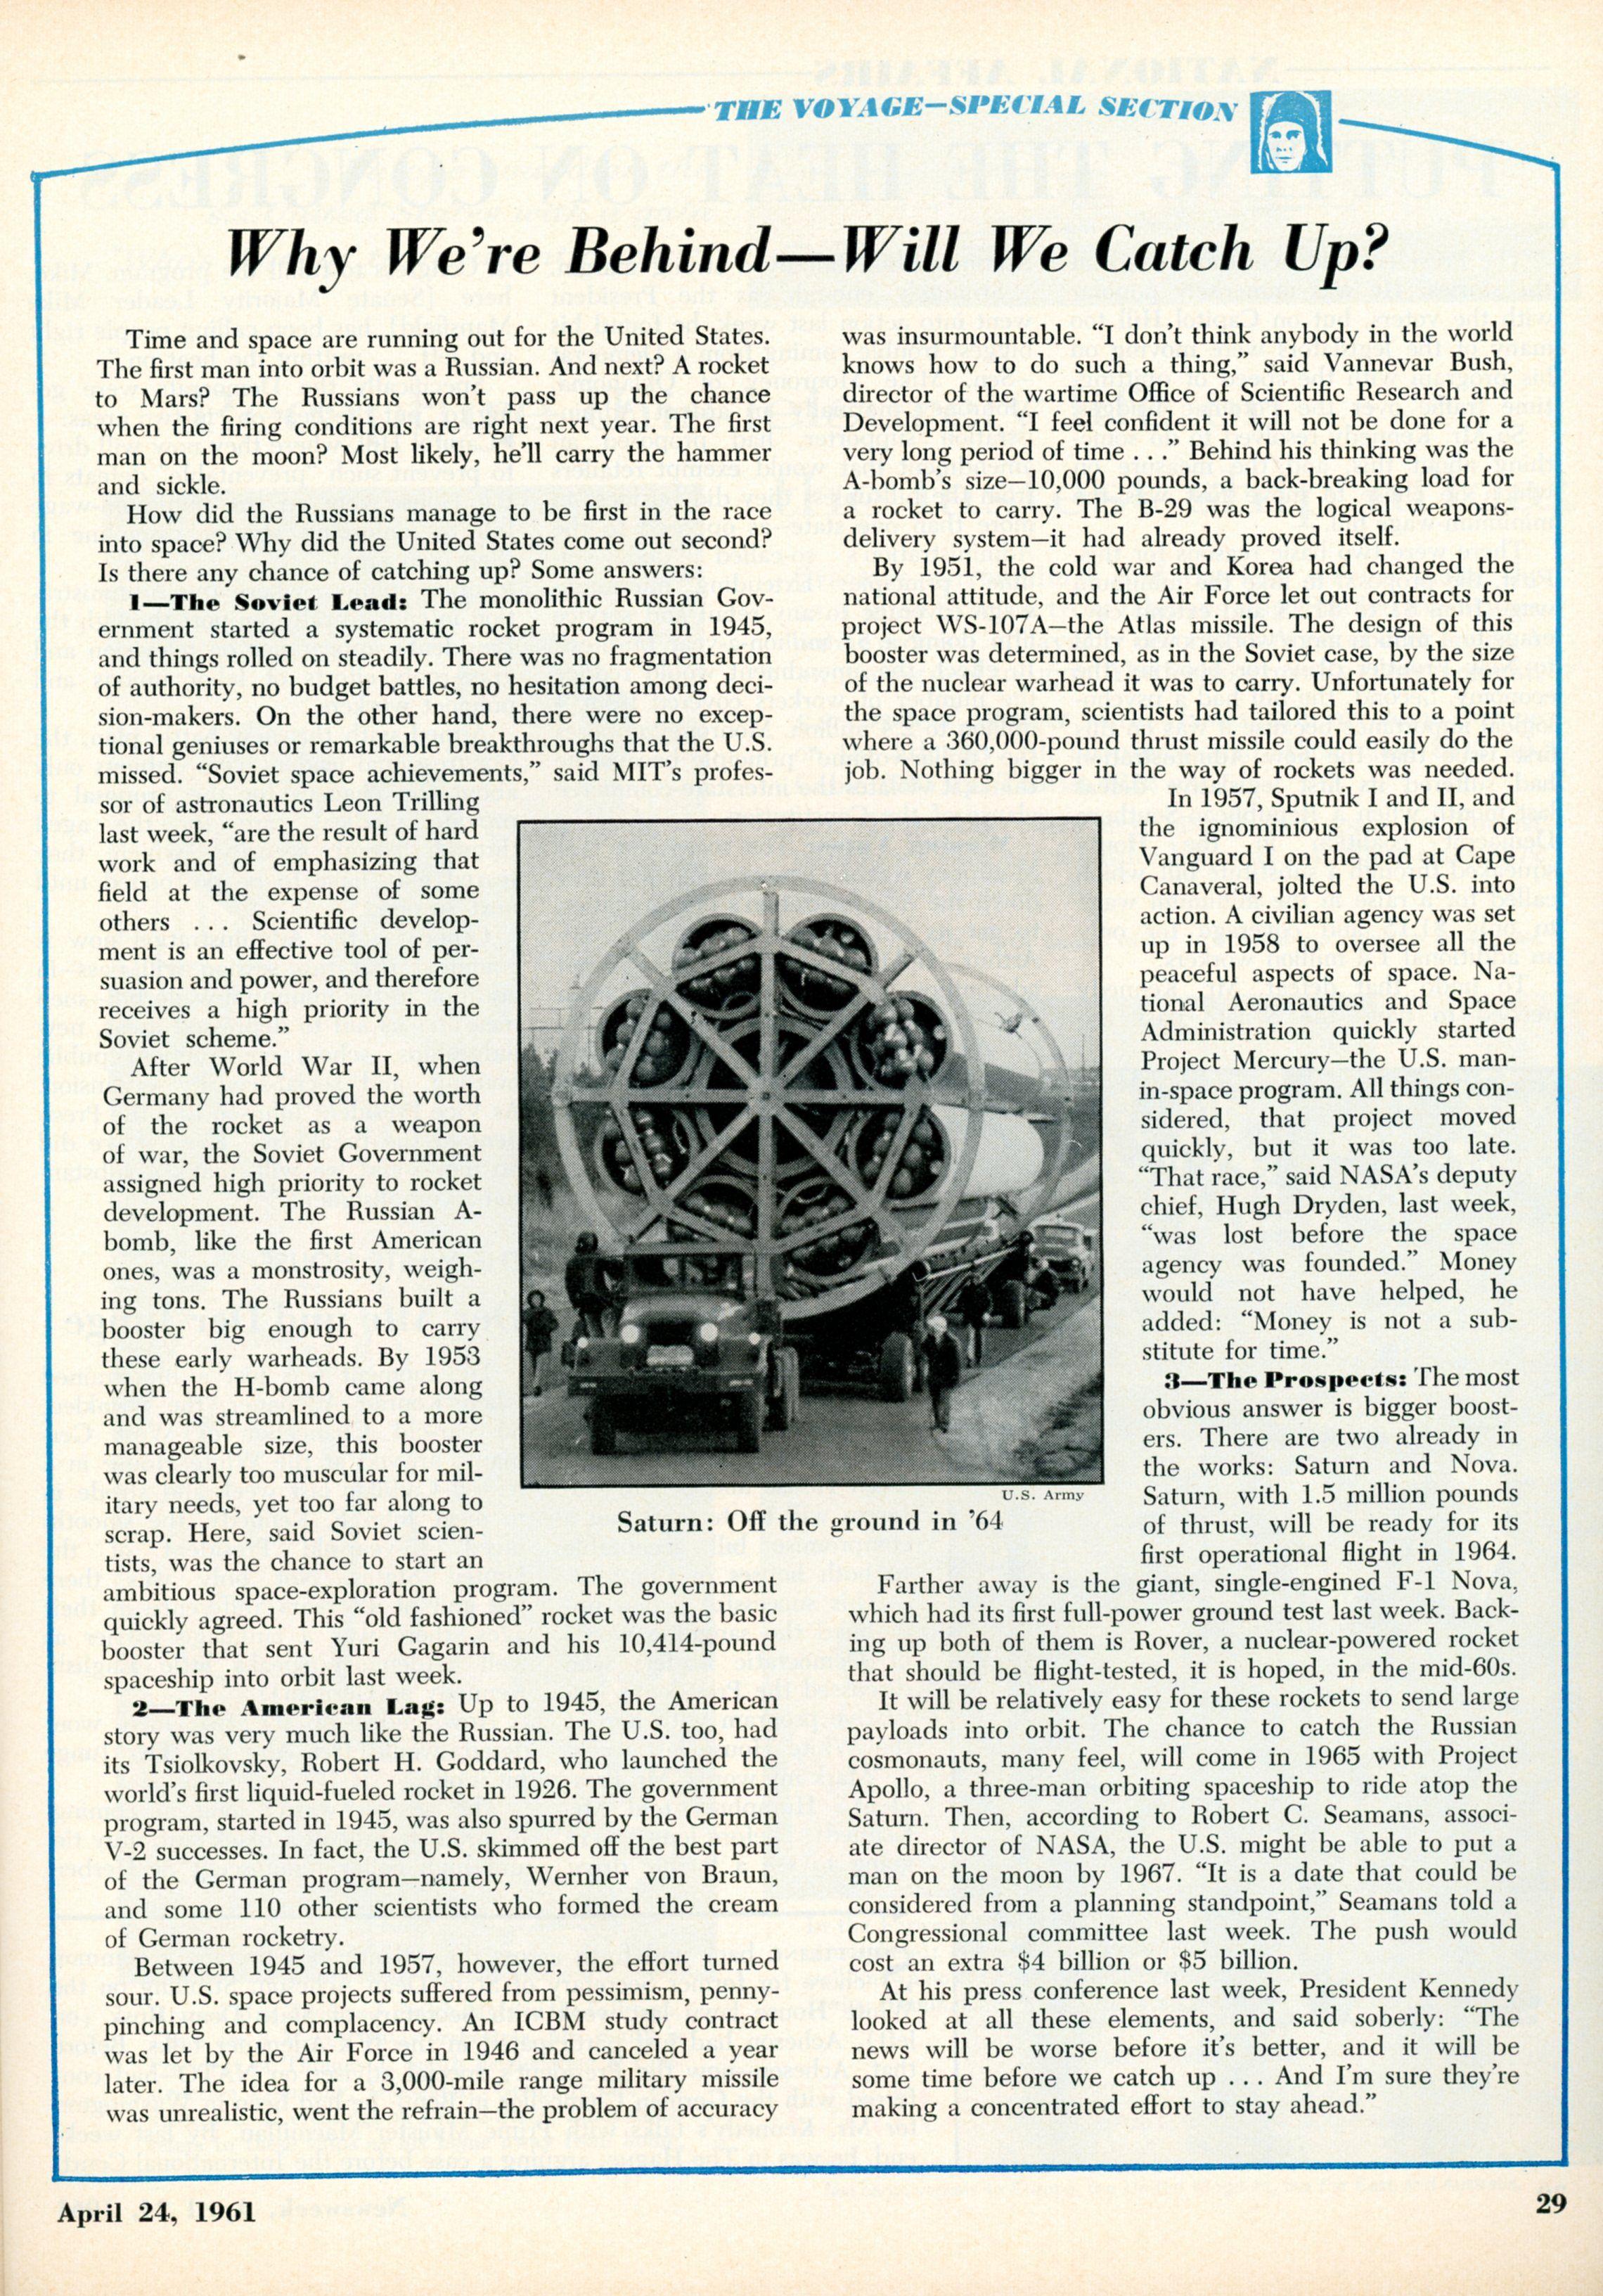 April 24 1961 pg 29